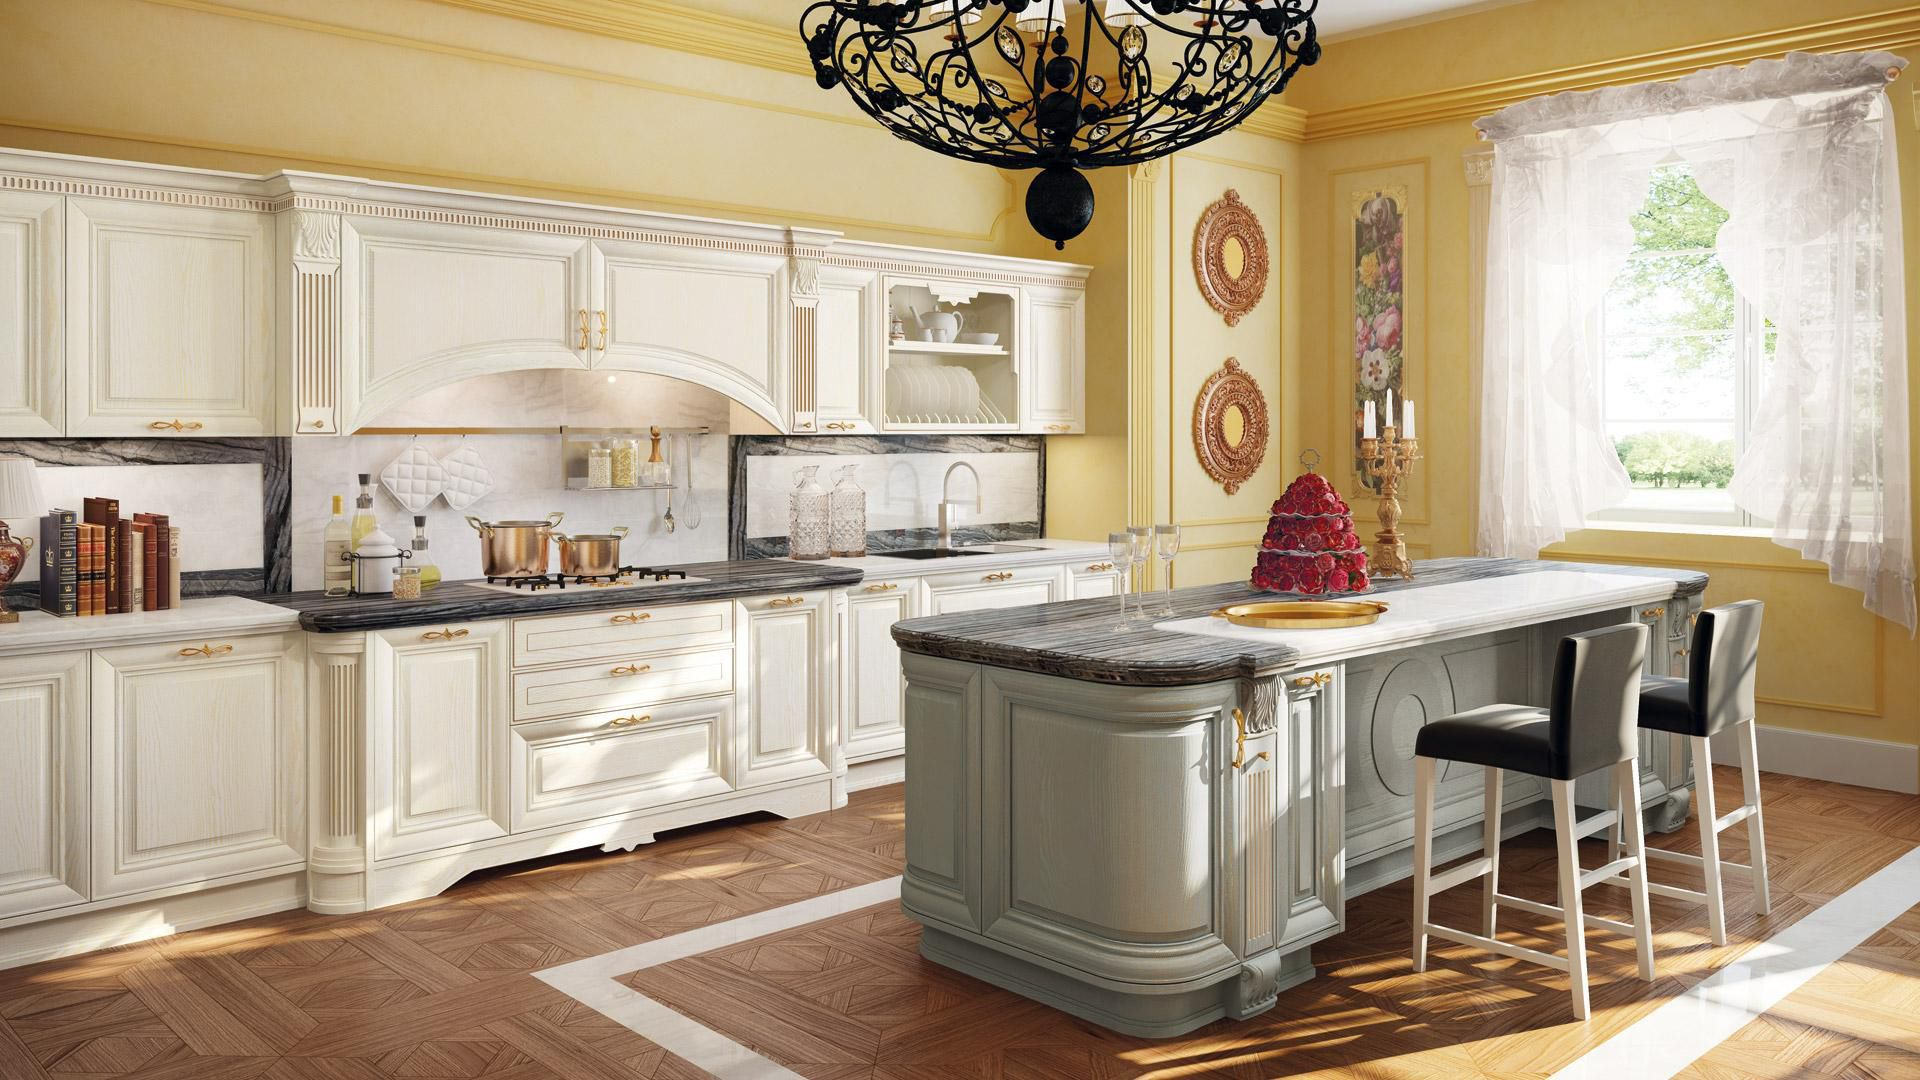 Cucine lube classiche pantheon: pantheon cucinandocucinando. lube